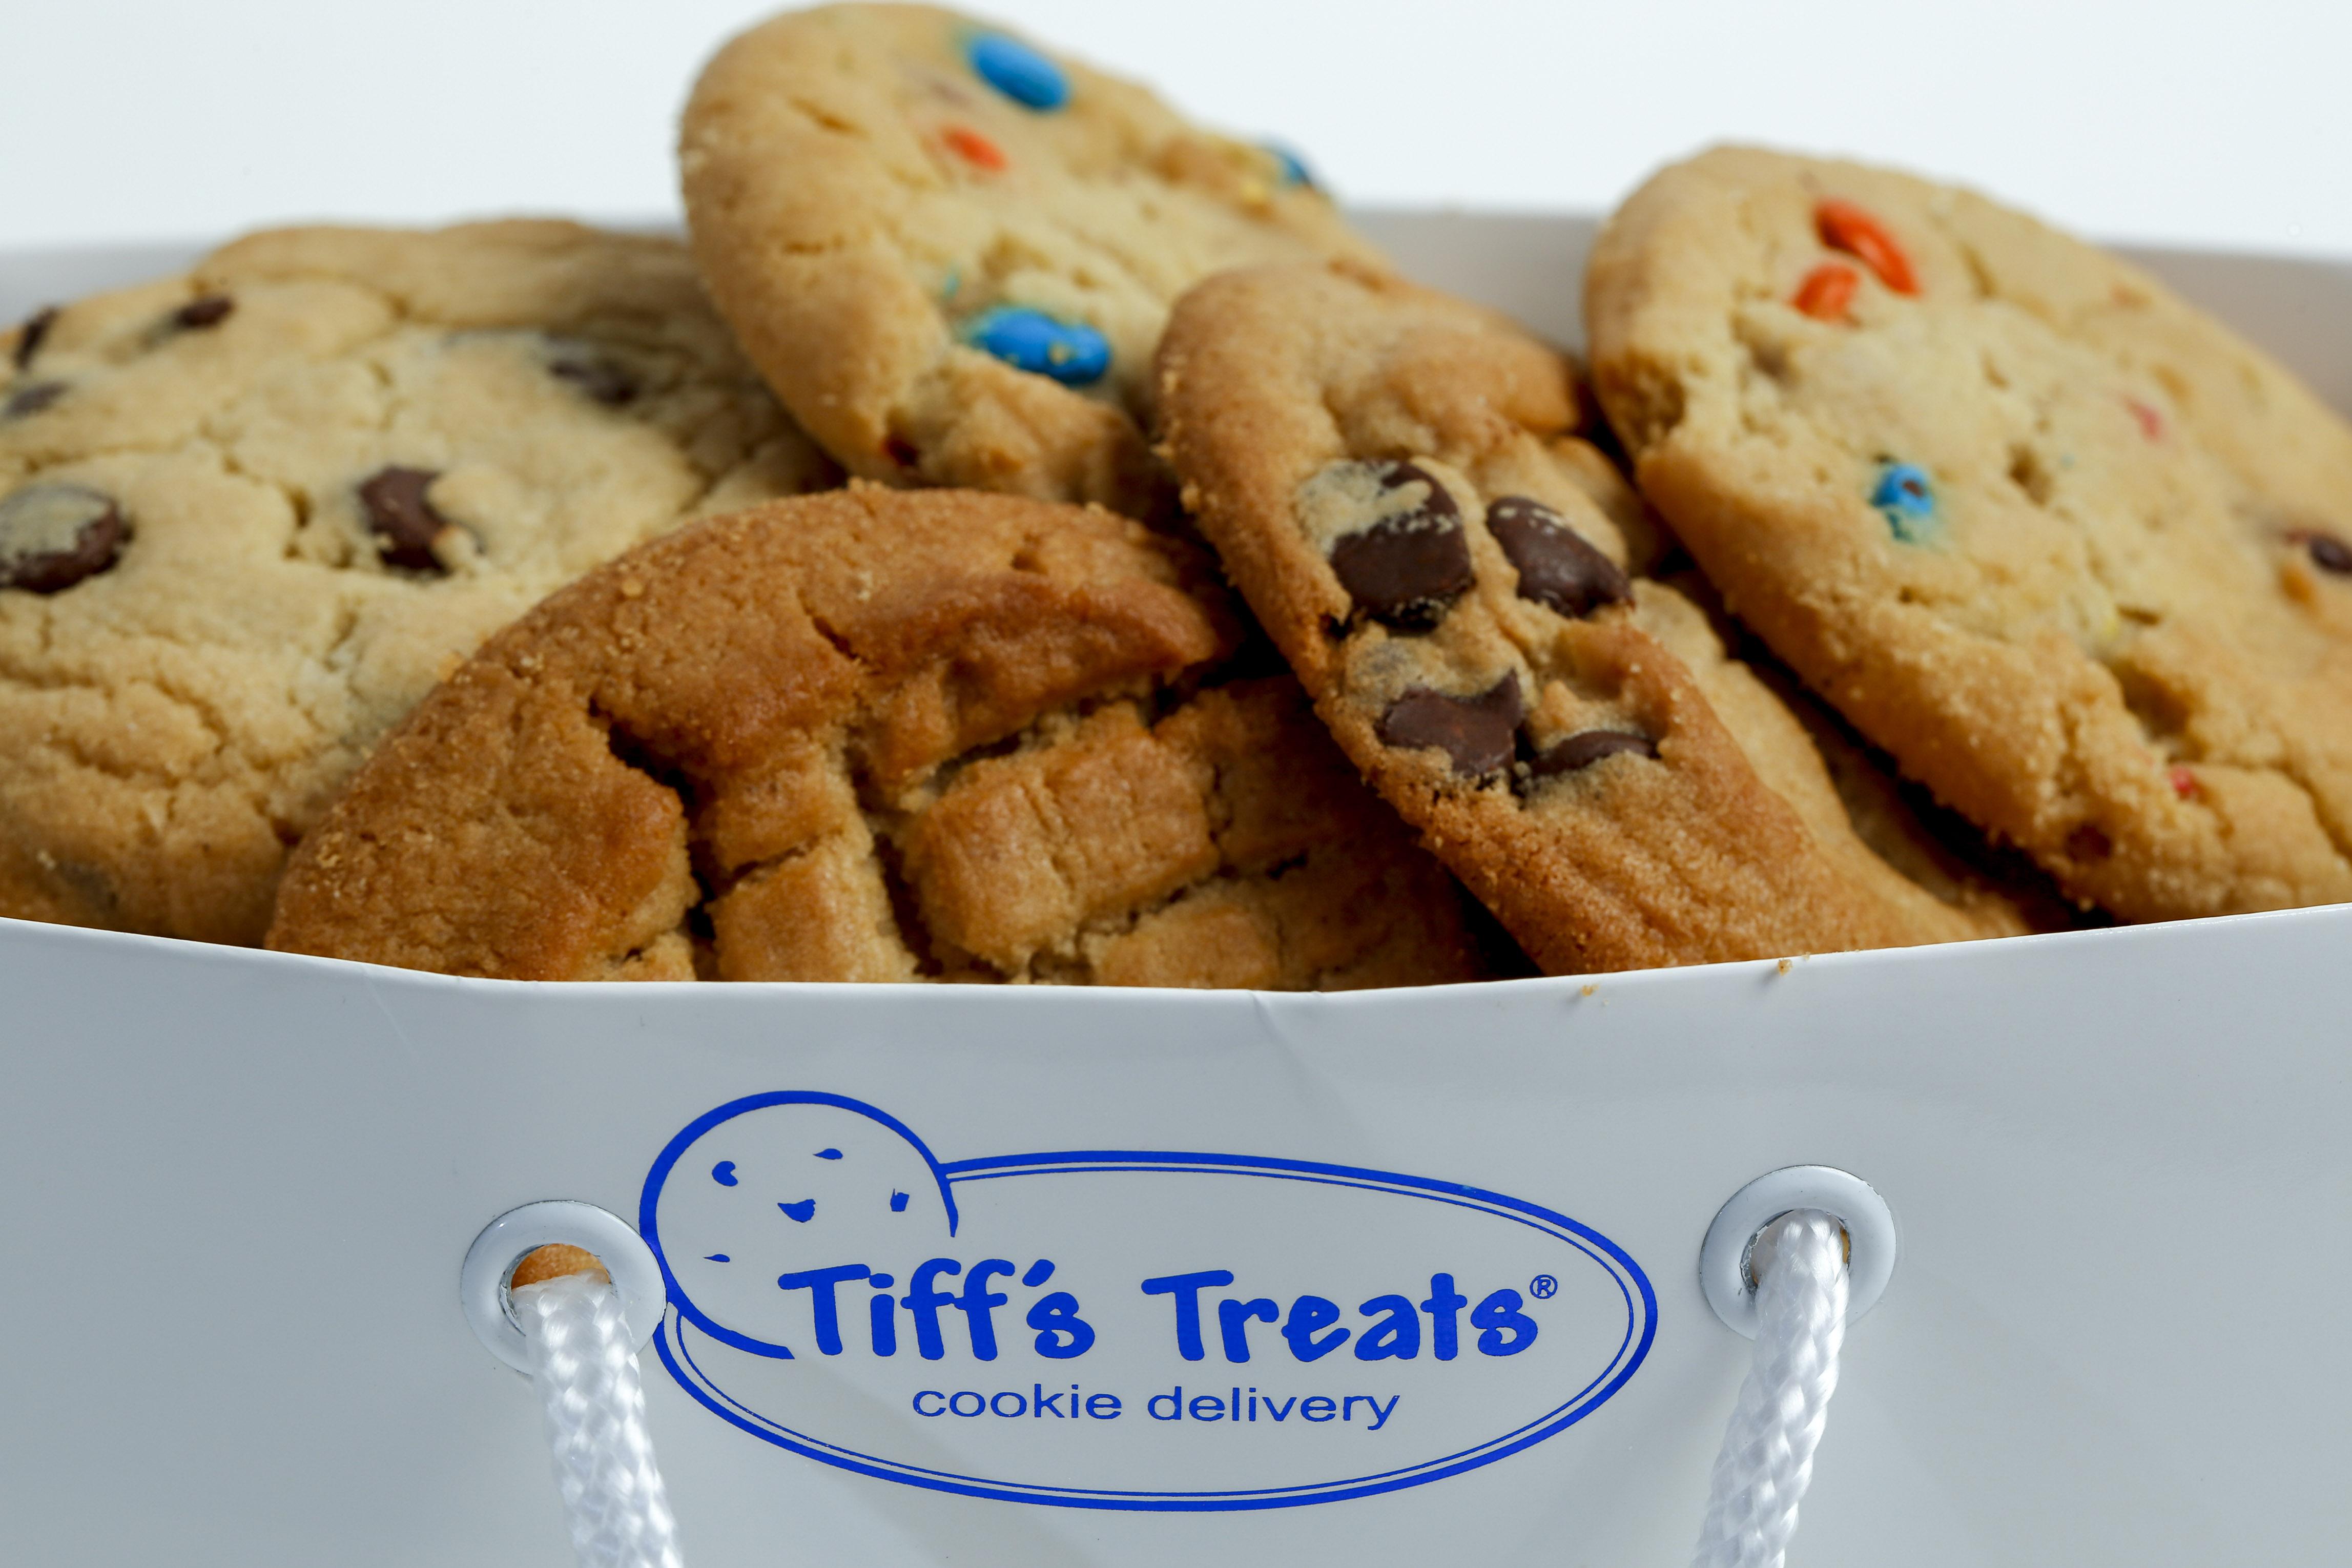 Tiff's Treats Closes $11M Funding Round |FinSMEs